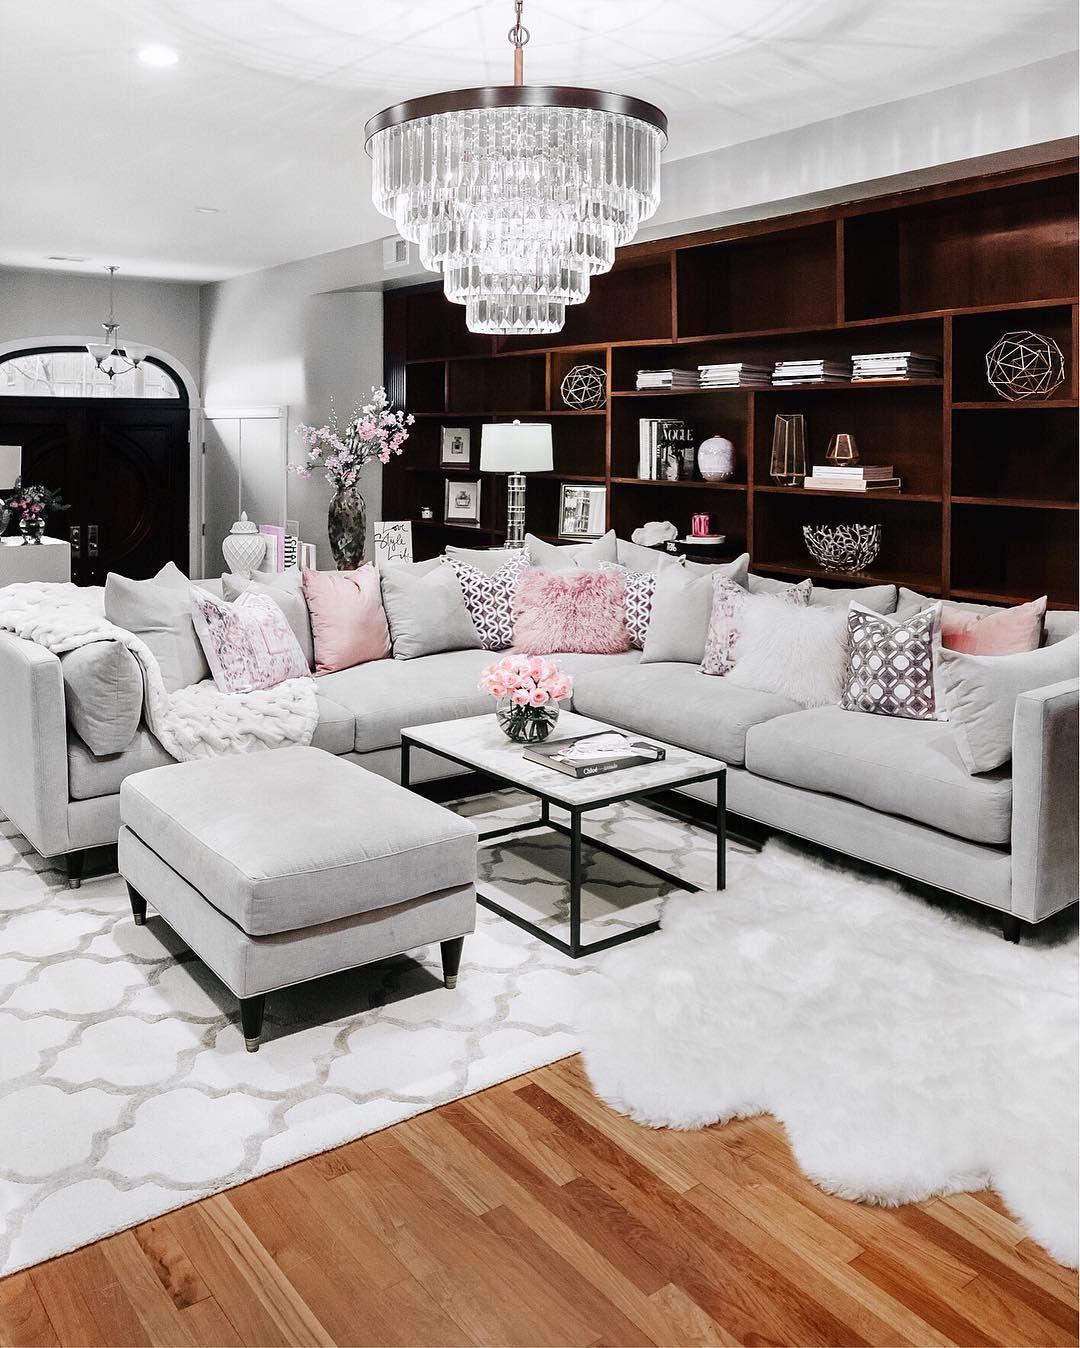 Olivia Rink Oliviarink Instagram Photos And Videos Feminine Living Room Elegant Living Room Decor Home